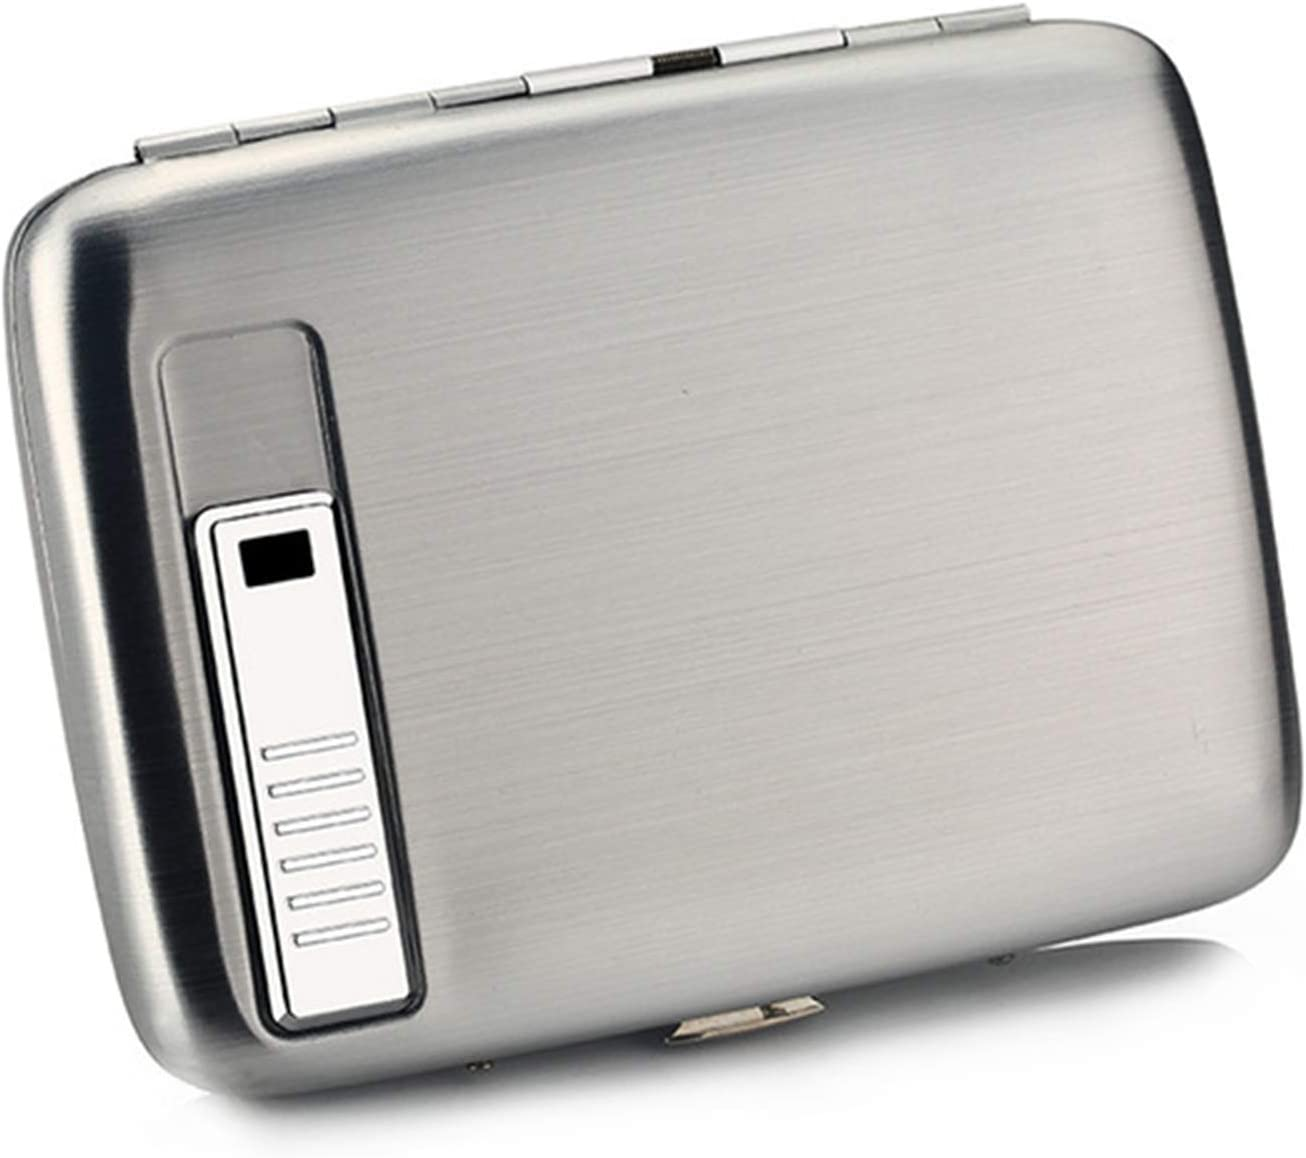 HEKQ Caja De Cigarrillos De Aluminio Soporte De Caja para Cigarrillo Delgado 100 Mm con Encendedor De Cigarrillos Recargable USB,Plata